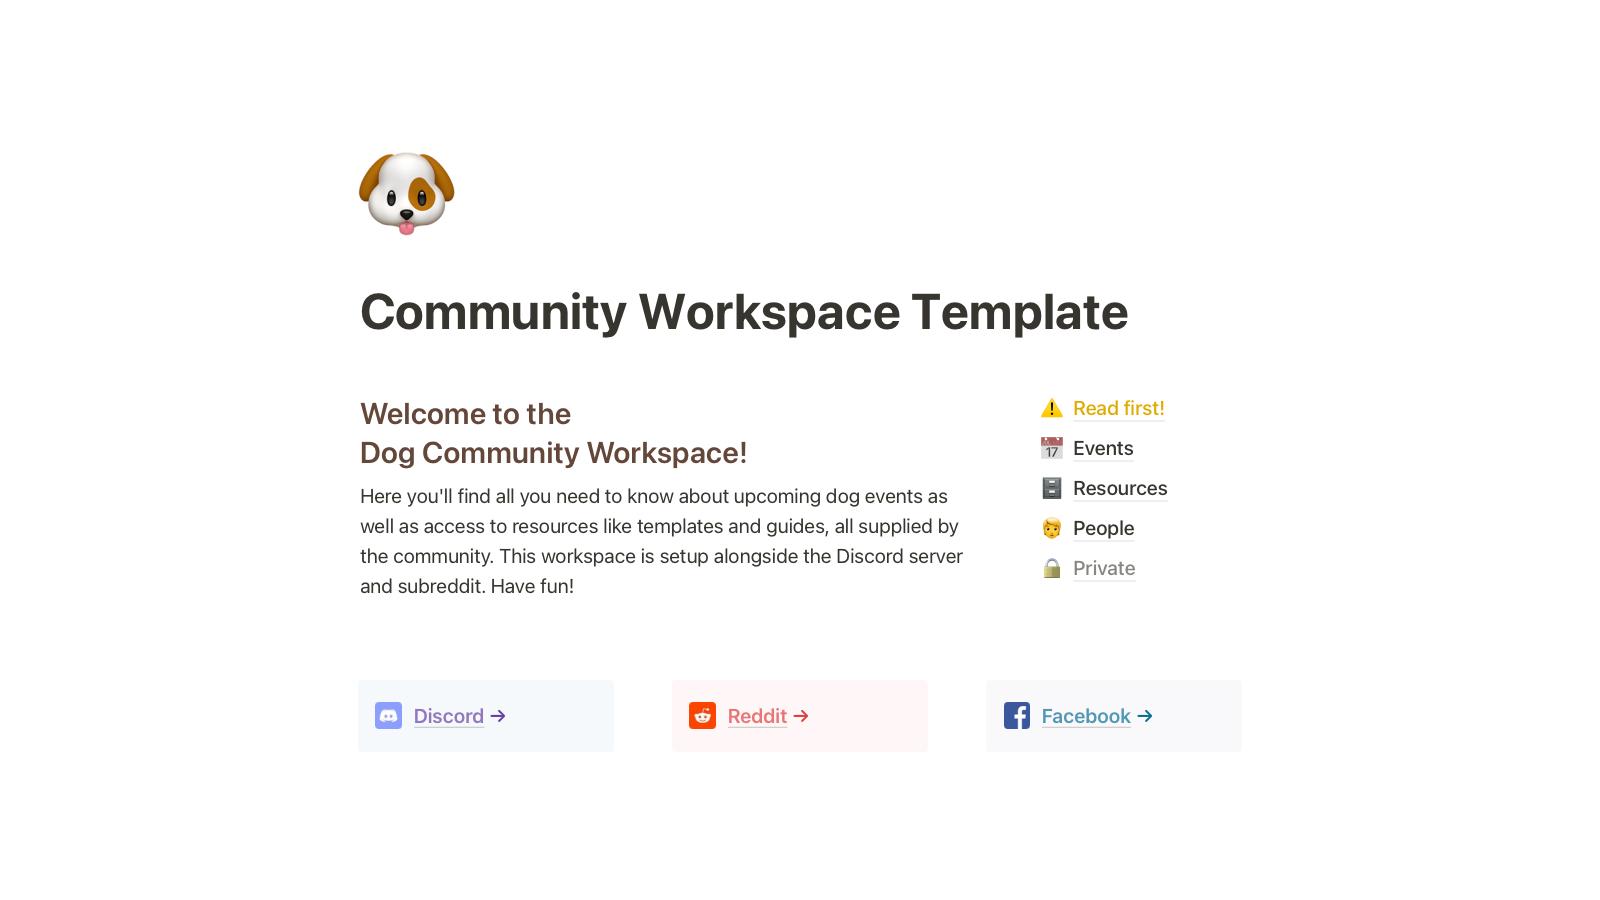 Community Workspace